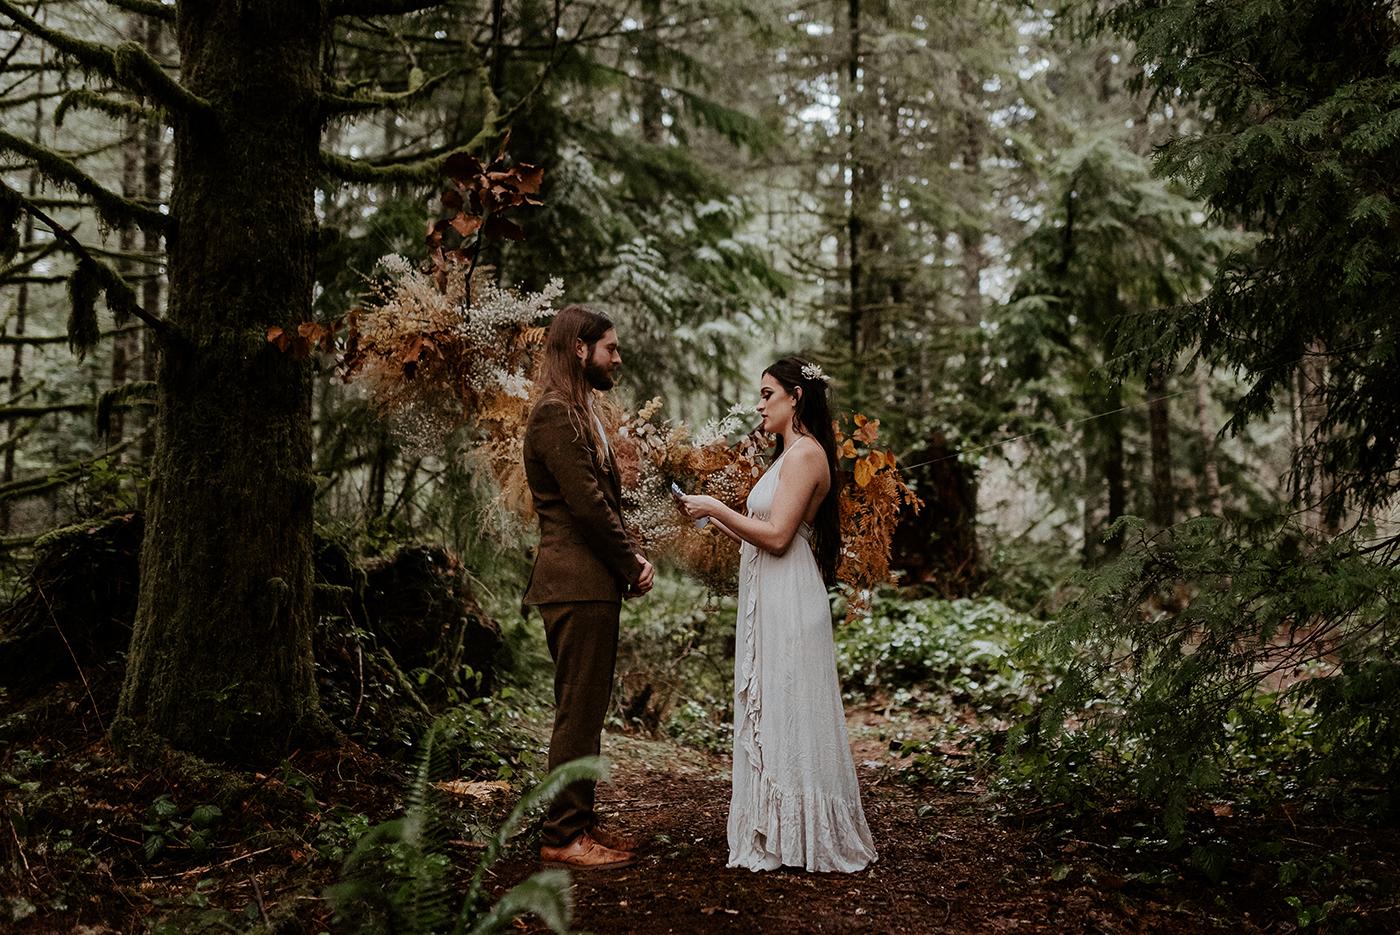 The Woodlands House Sandy Oregon Elopement PNW Wedding How To Plan A Destination Elopement Anais Possamai Photography 1